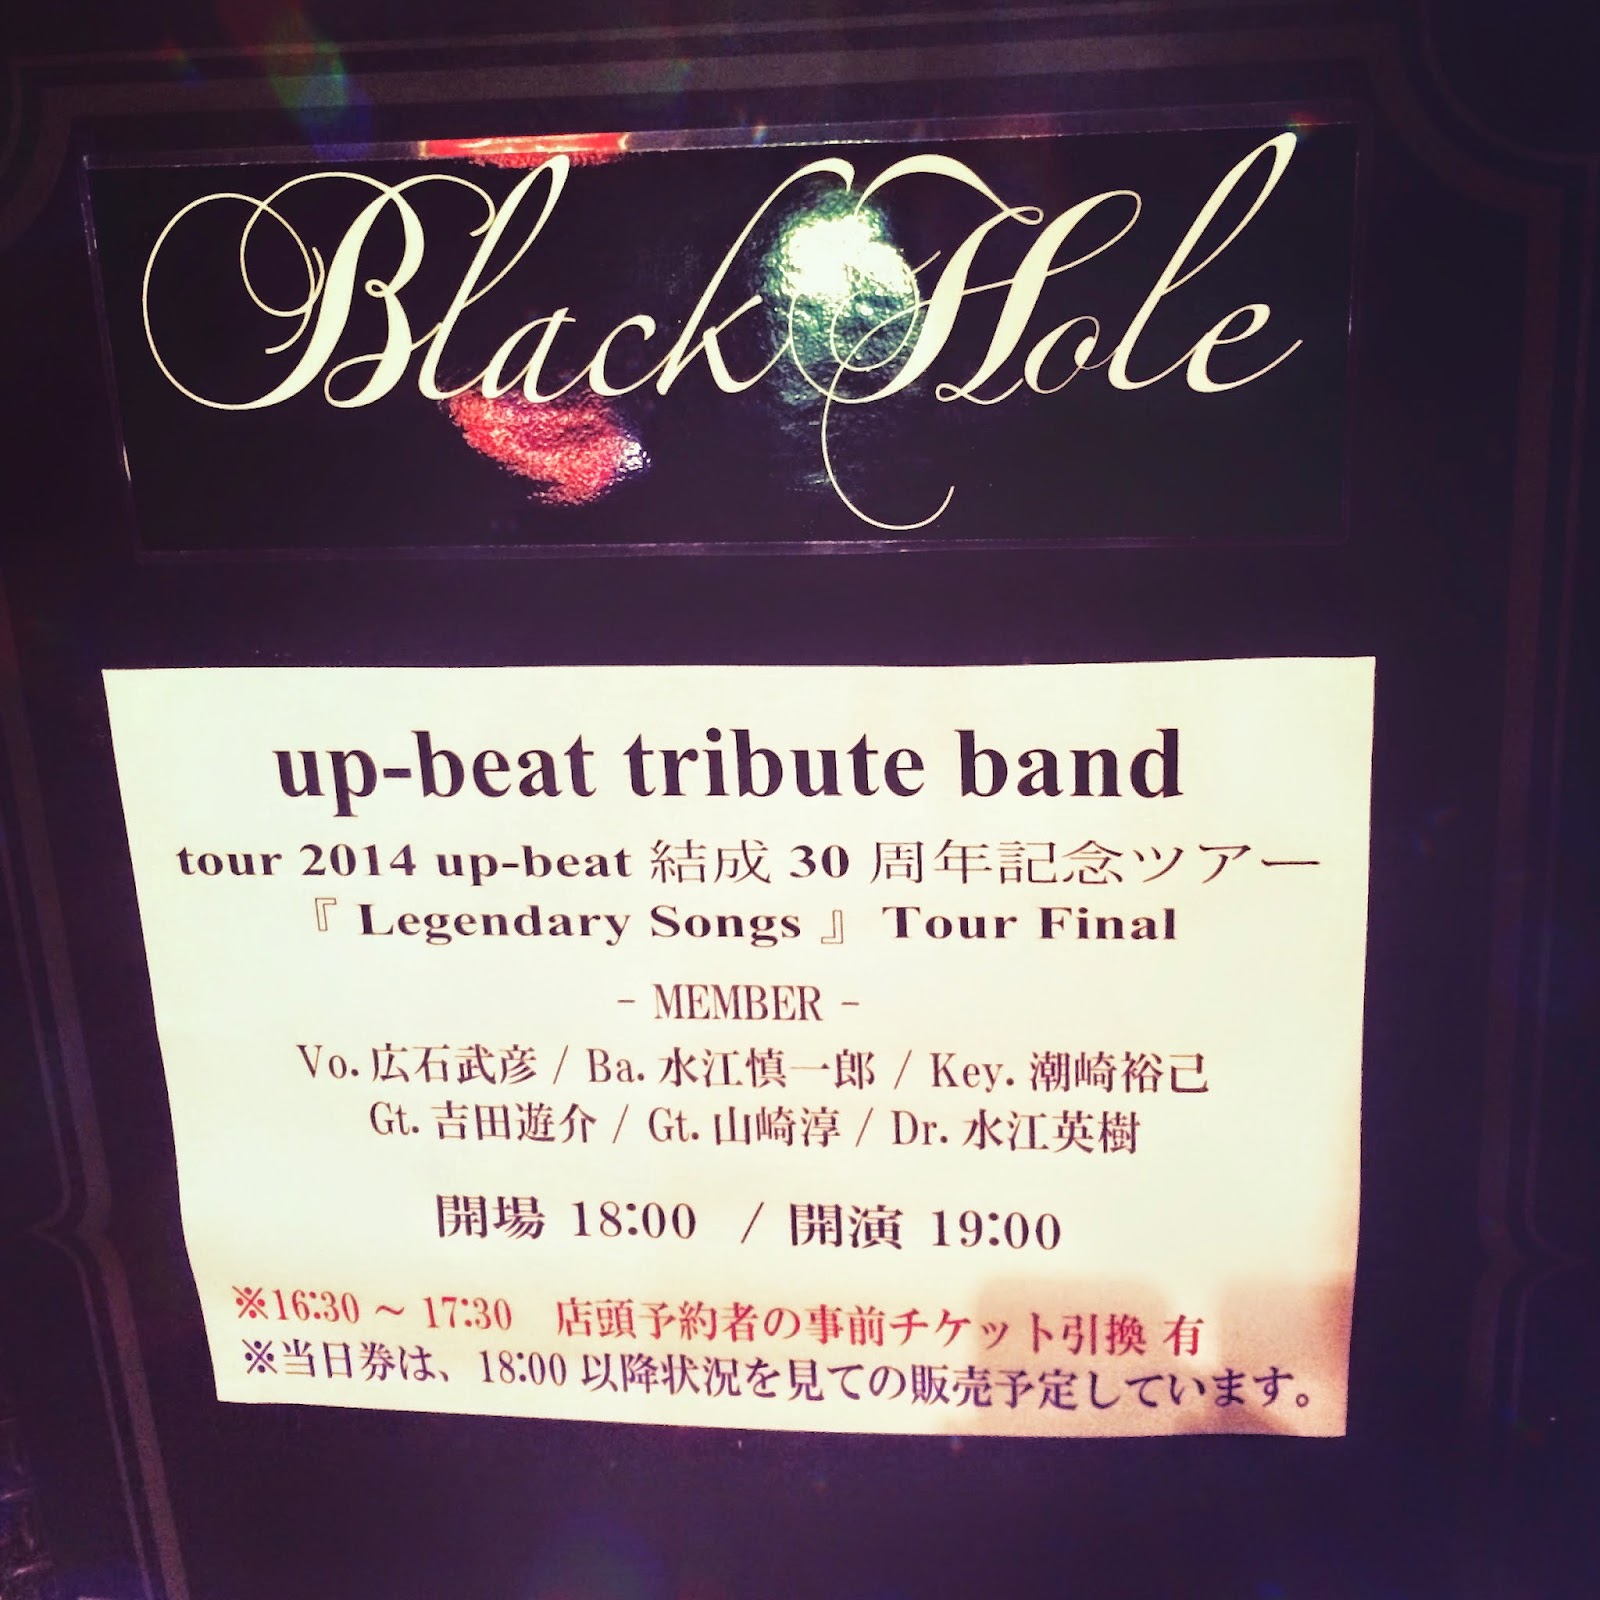 up-beat tribute band 12/6@池袋 Black Hole